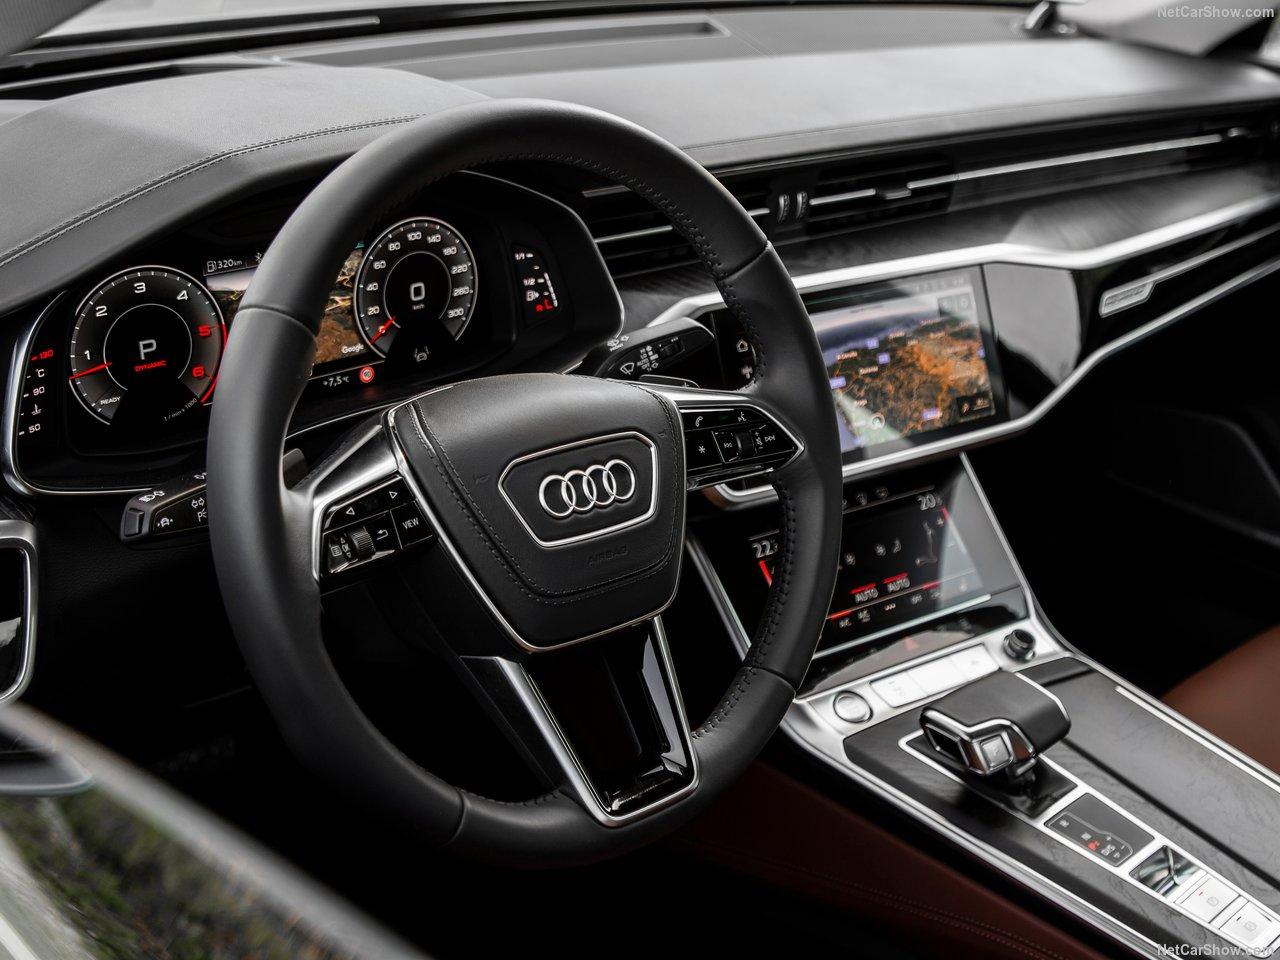 Audi-A6-2019-1280-5c_201807201011067f6.jpg